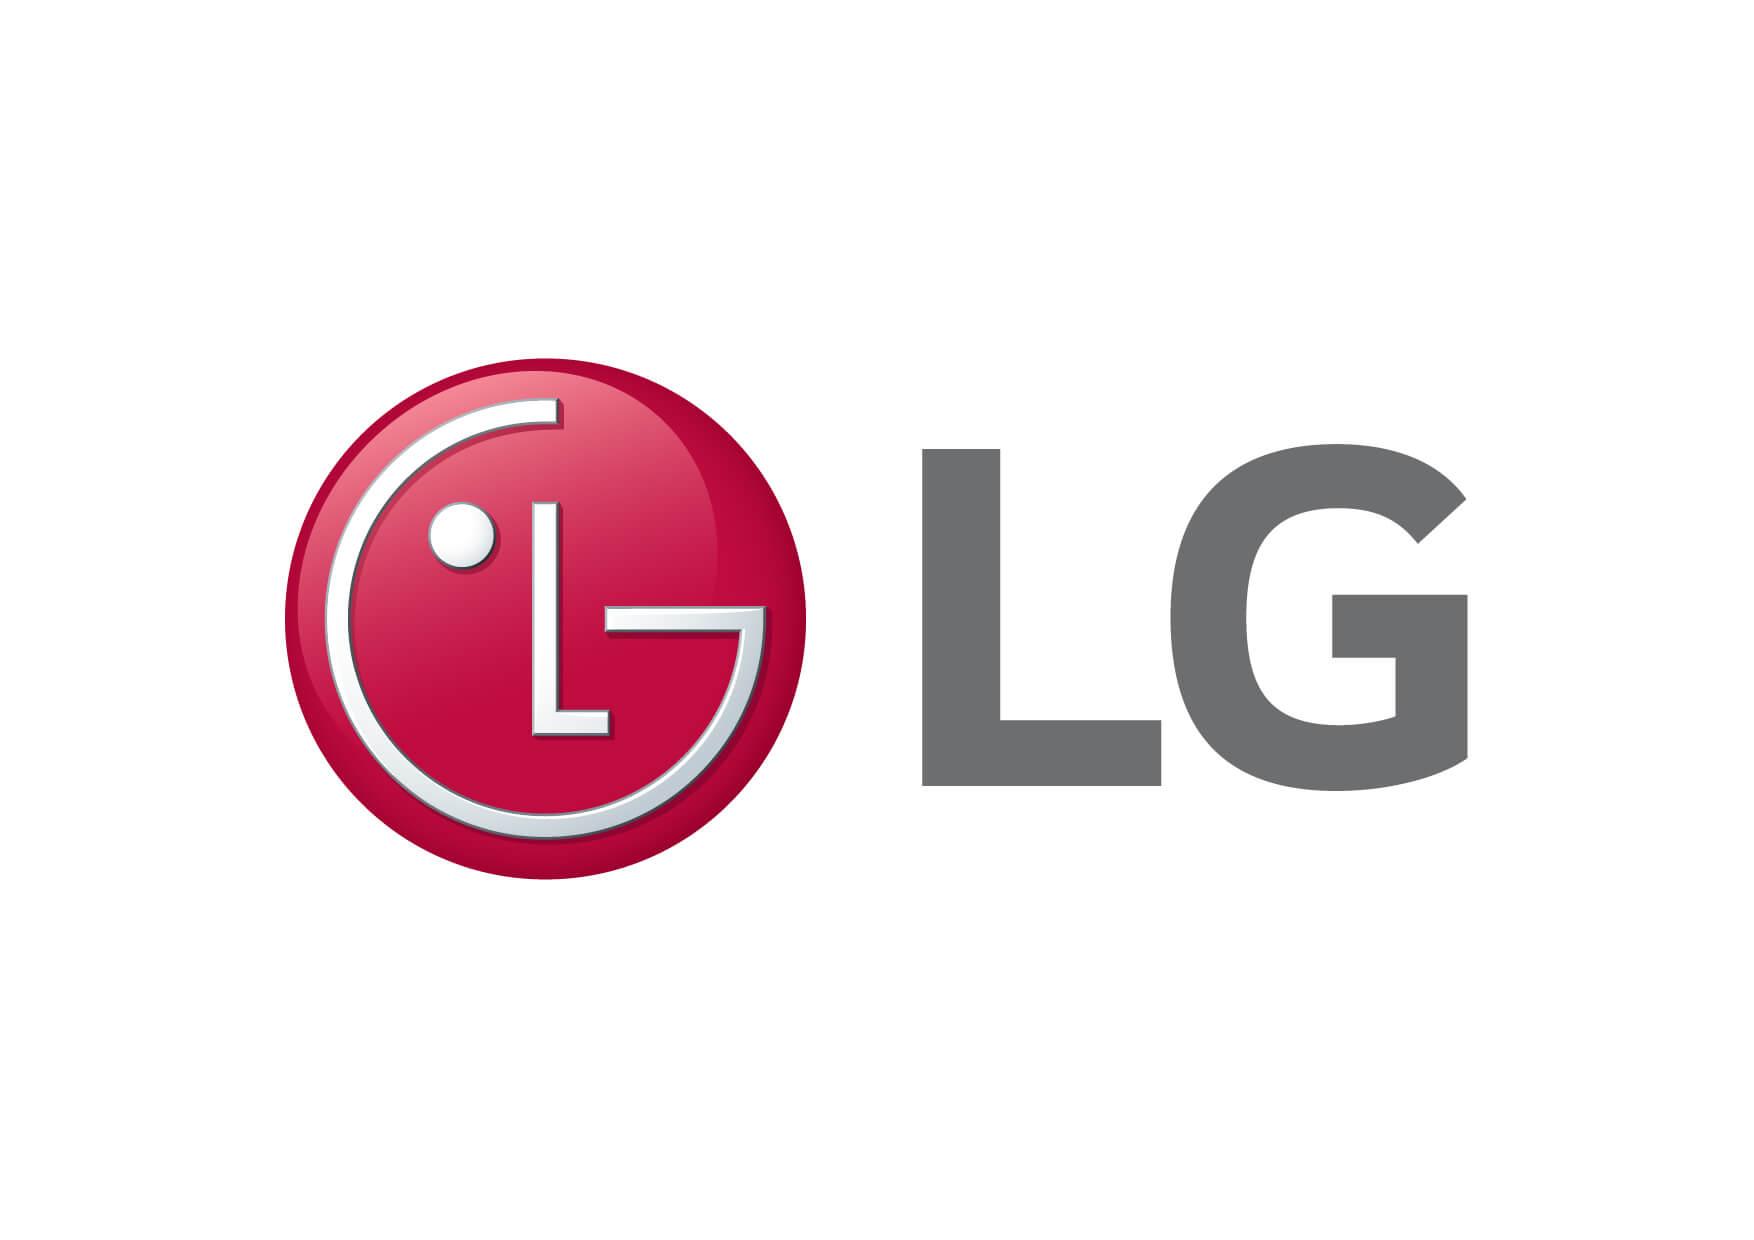 lg-ci_3d_rgb_standard_basic